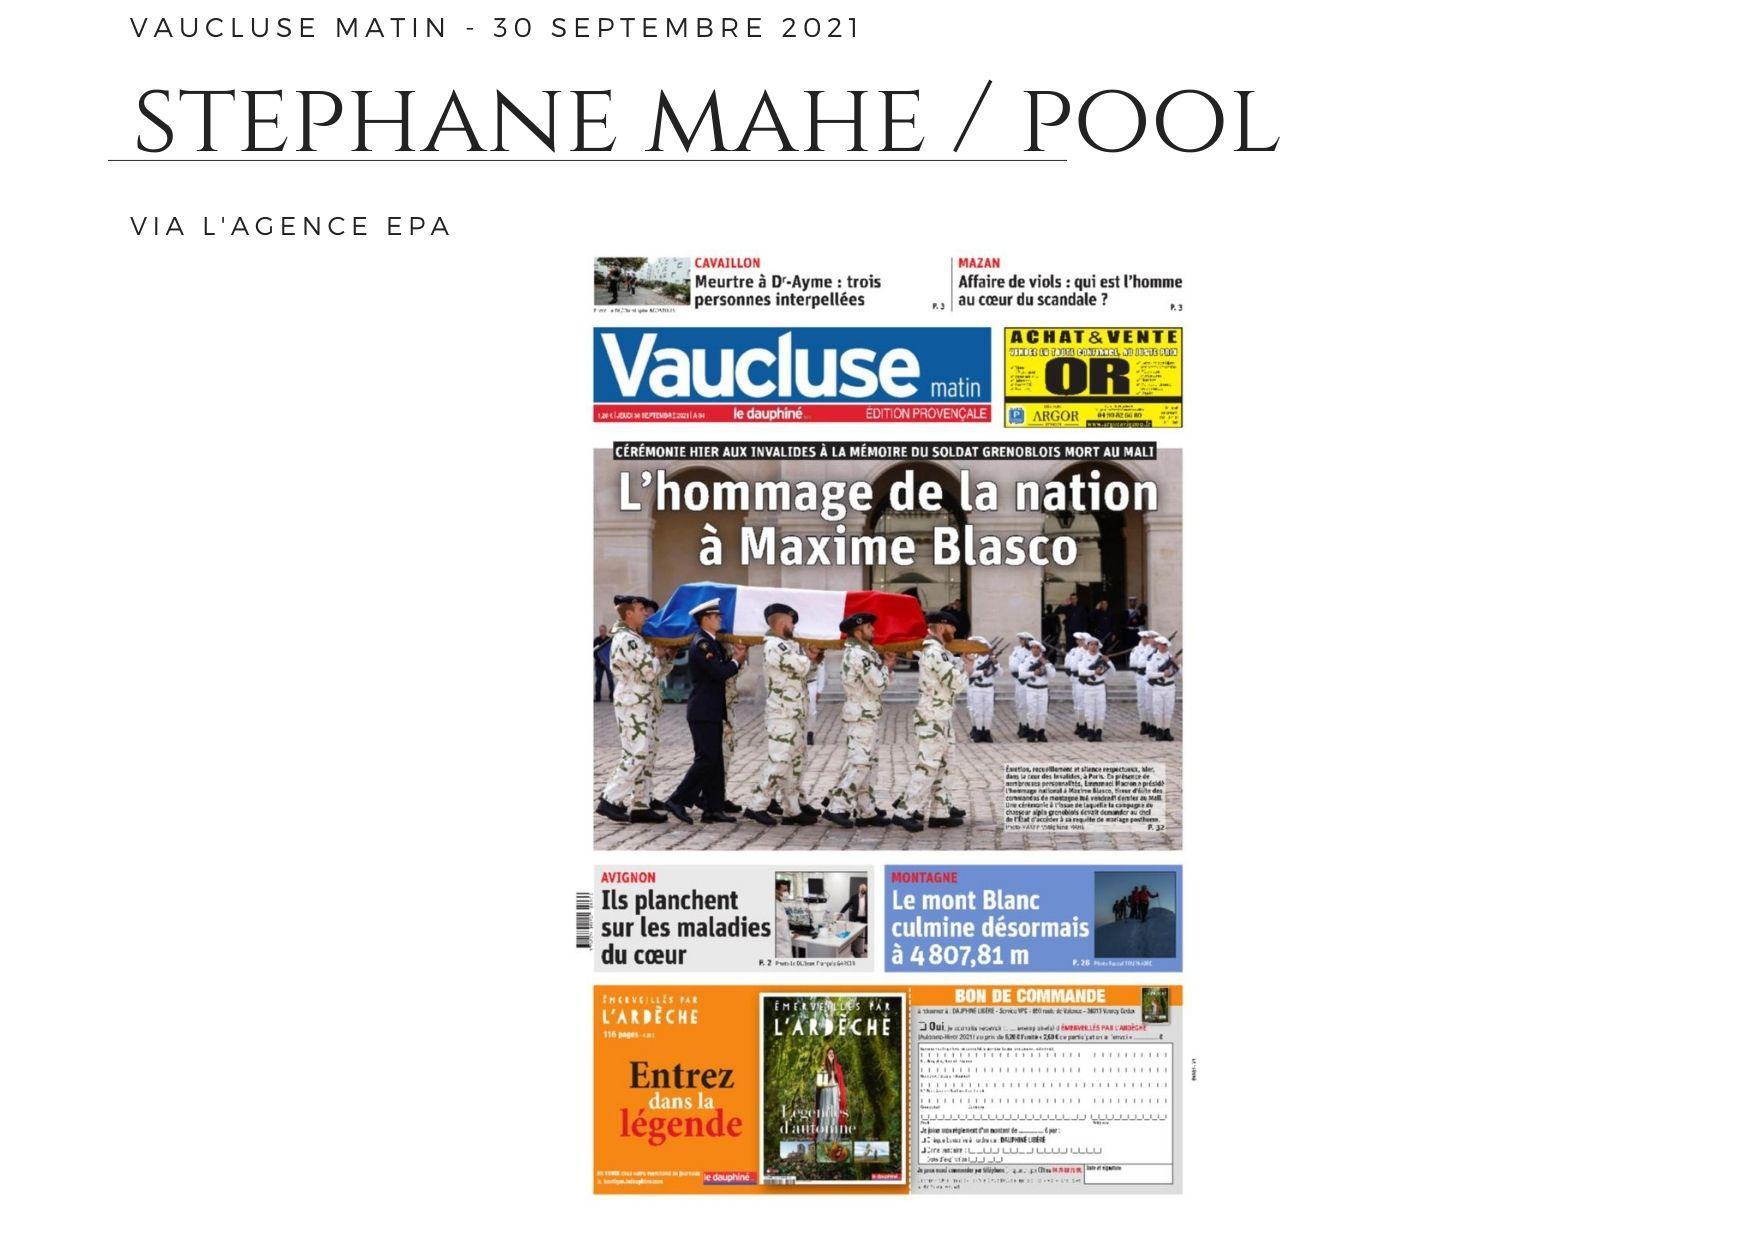 Vaucluse Matin - 30 septembre 2021